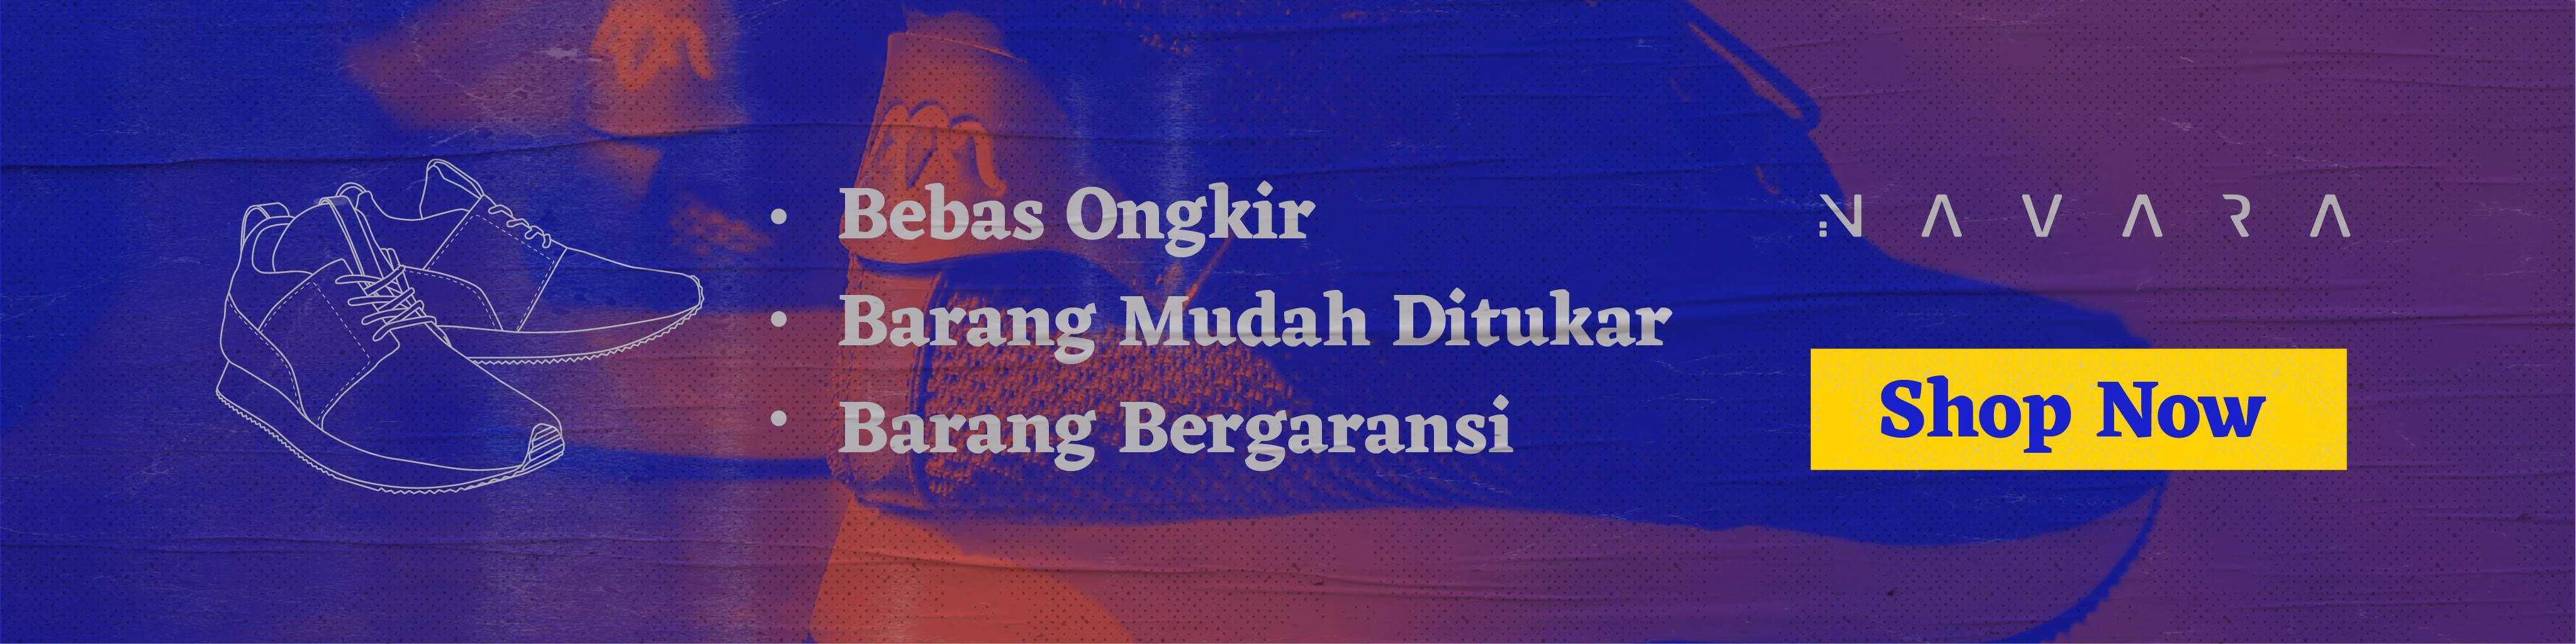 1b9e41ad3b Navara Dept Store   Lazada Indonesia